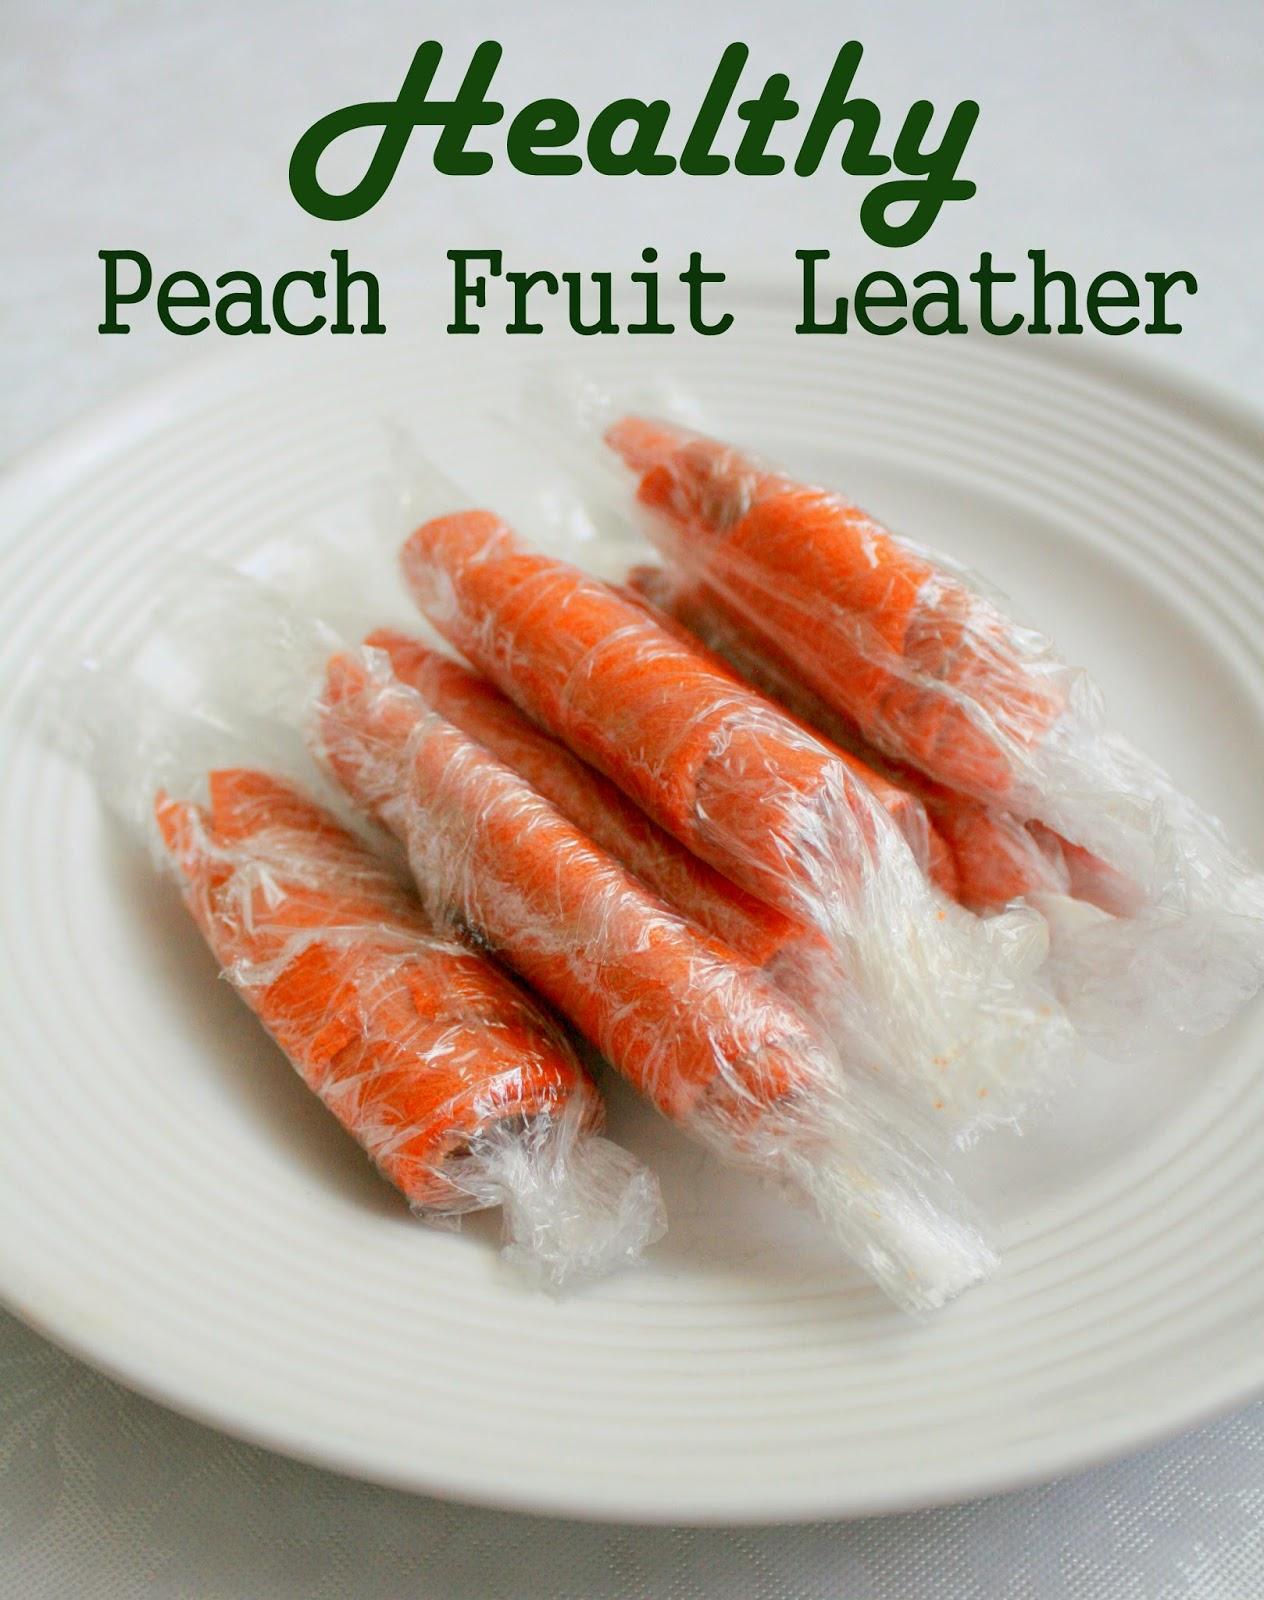 ... fruit leather rainbow fruit leathers peach fruit leather cinnamon